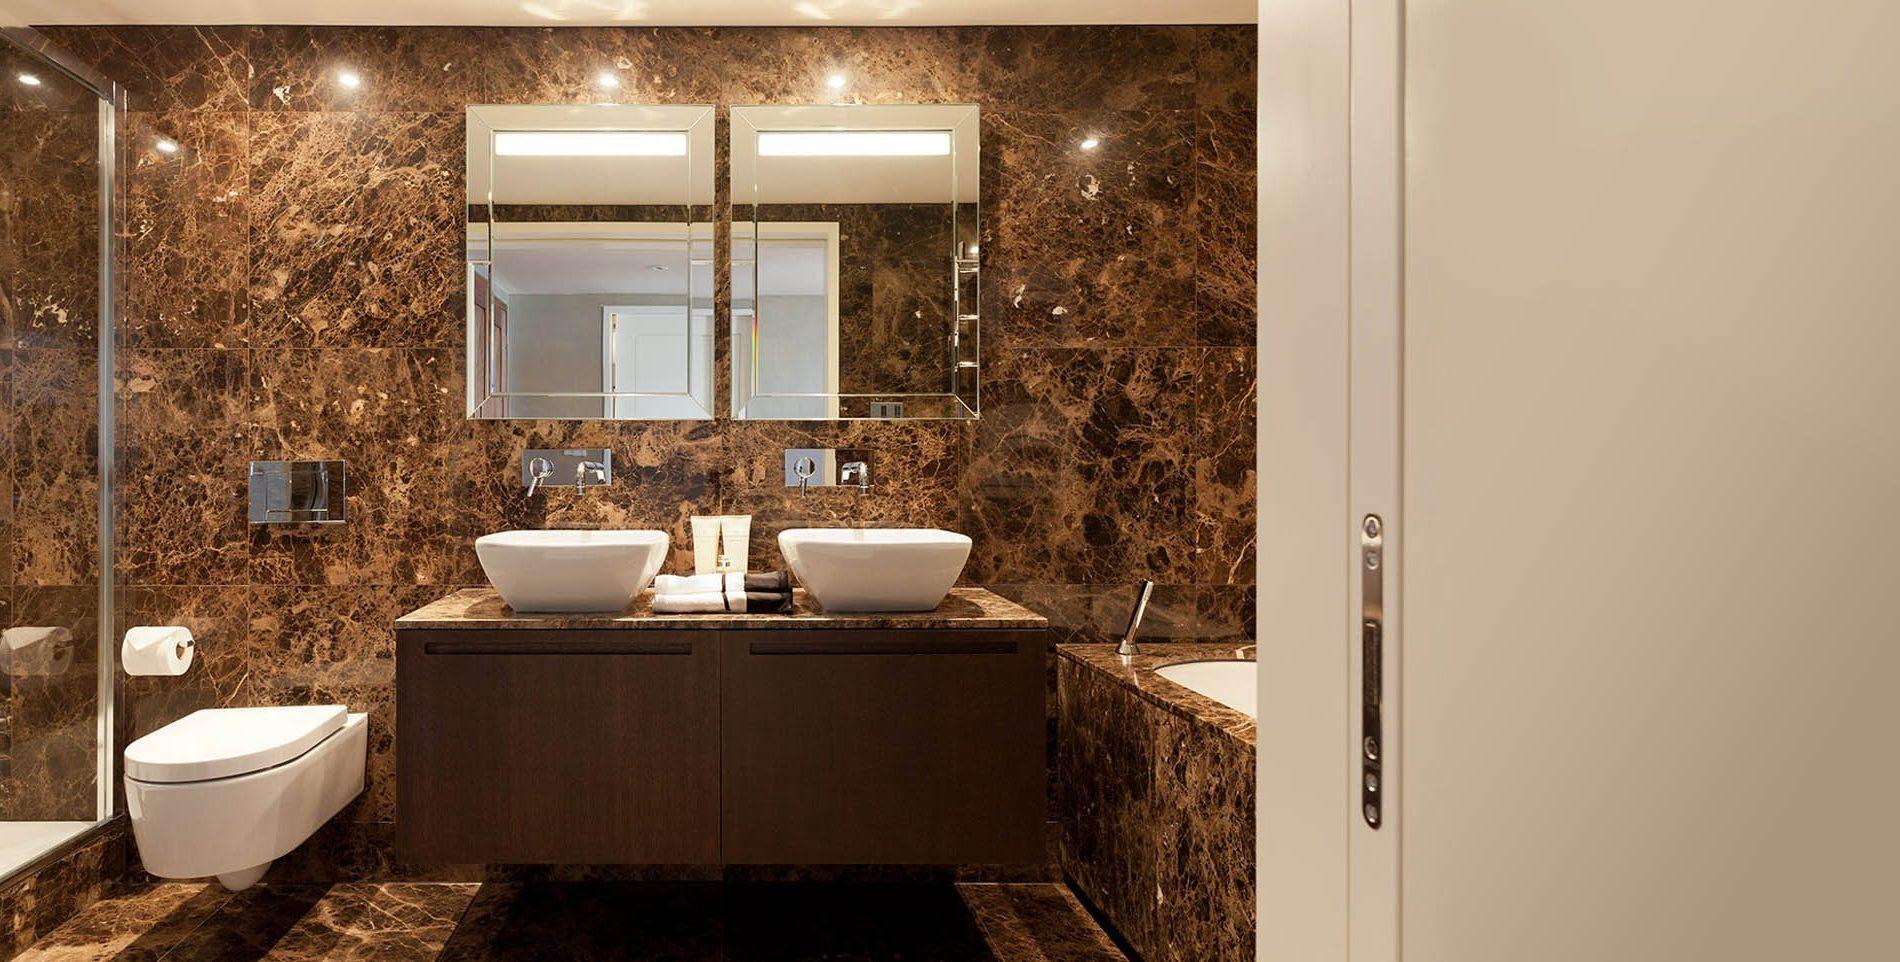 Encimera de baño de mármol - Inspiración - Levantina